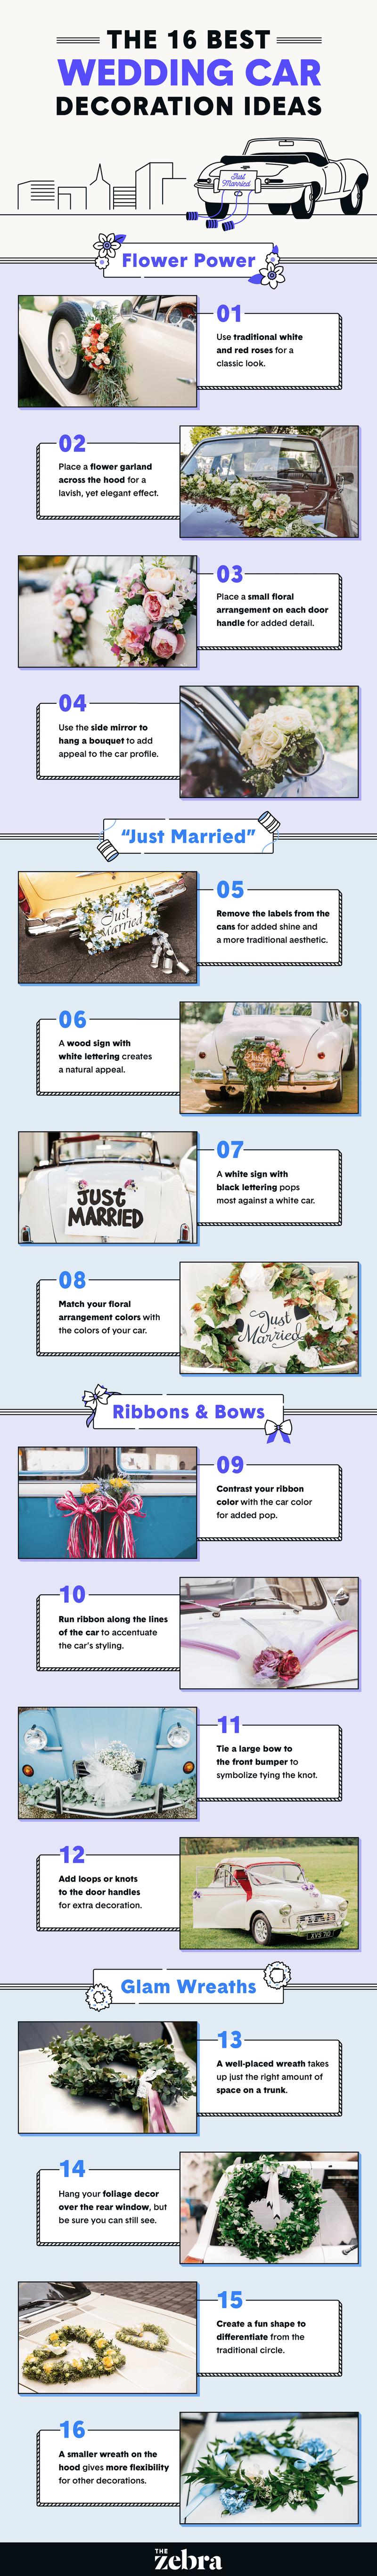 wedding car decor infographic